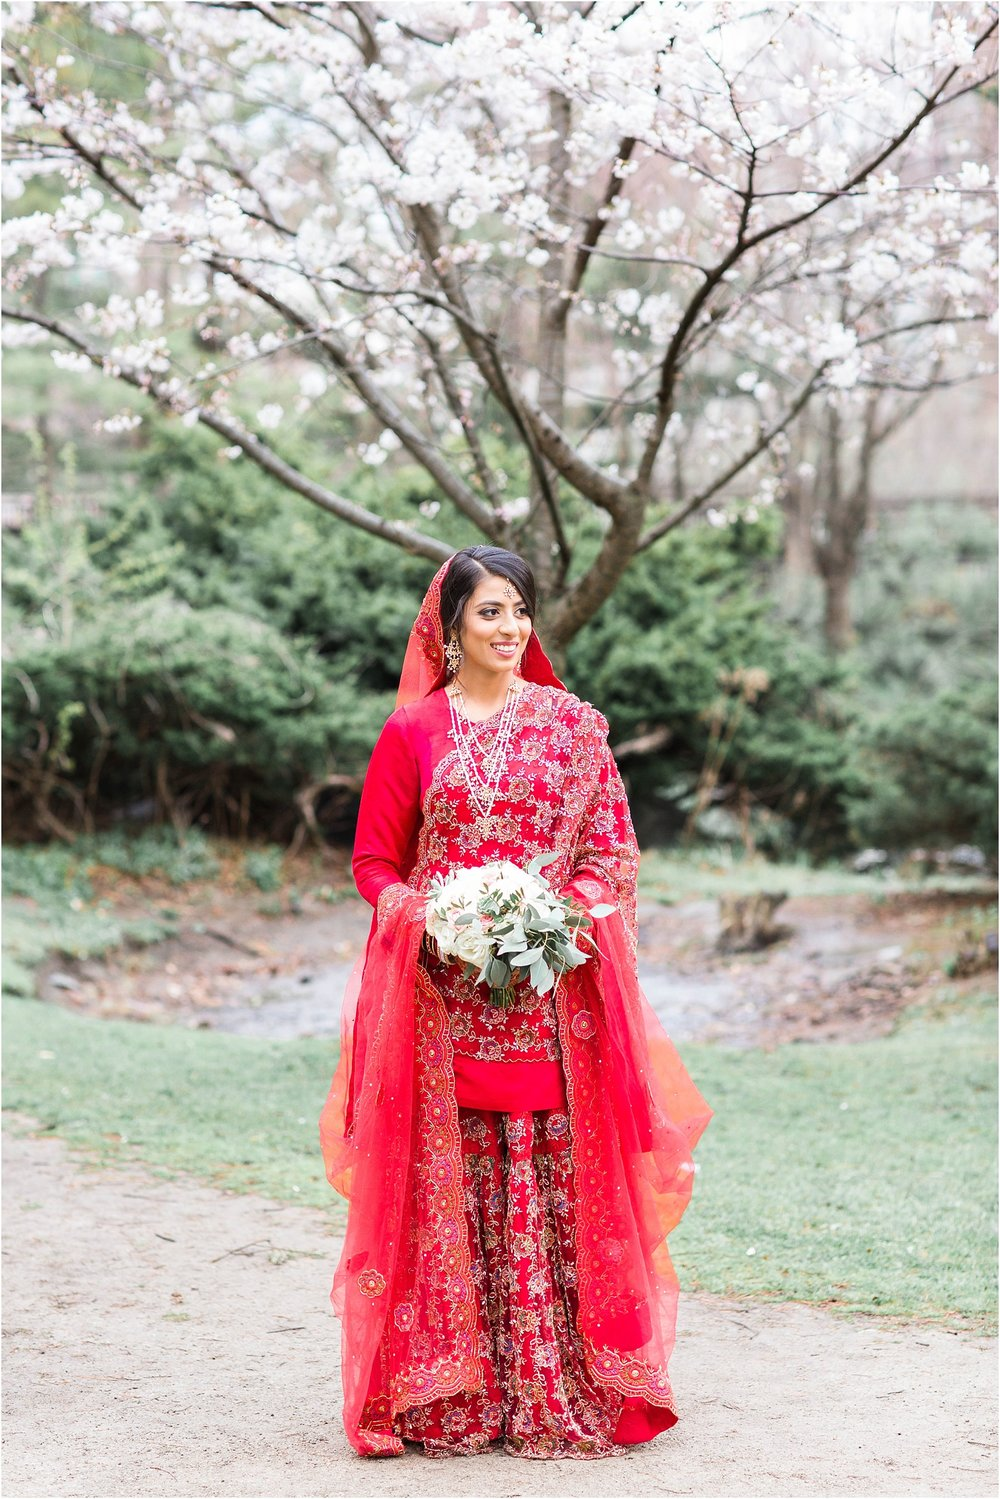 Jame-Masjid-Coopers-Mosque-Kariya-Park-Cherry-Blossoms-Wedding-Toronto-Mississauga-Brampton-Scarborough-GTA-Pakistani-Indian-Wedding-Engagement-Photographer-Photography_0067.jpg